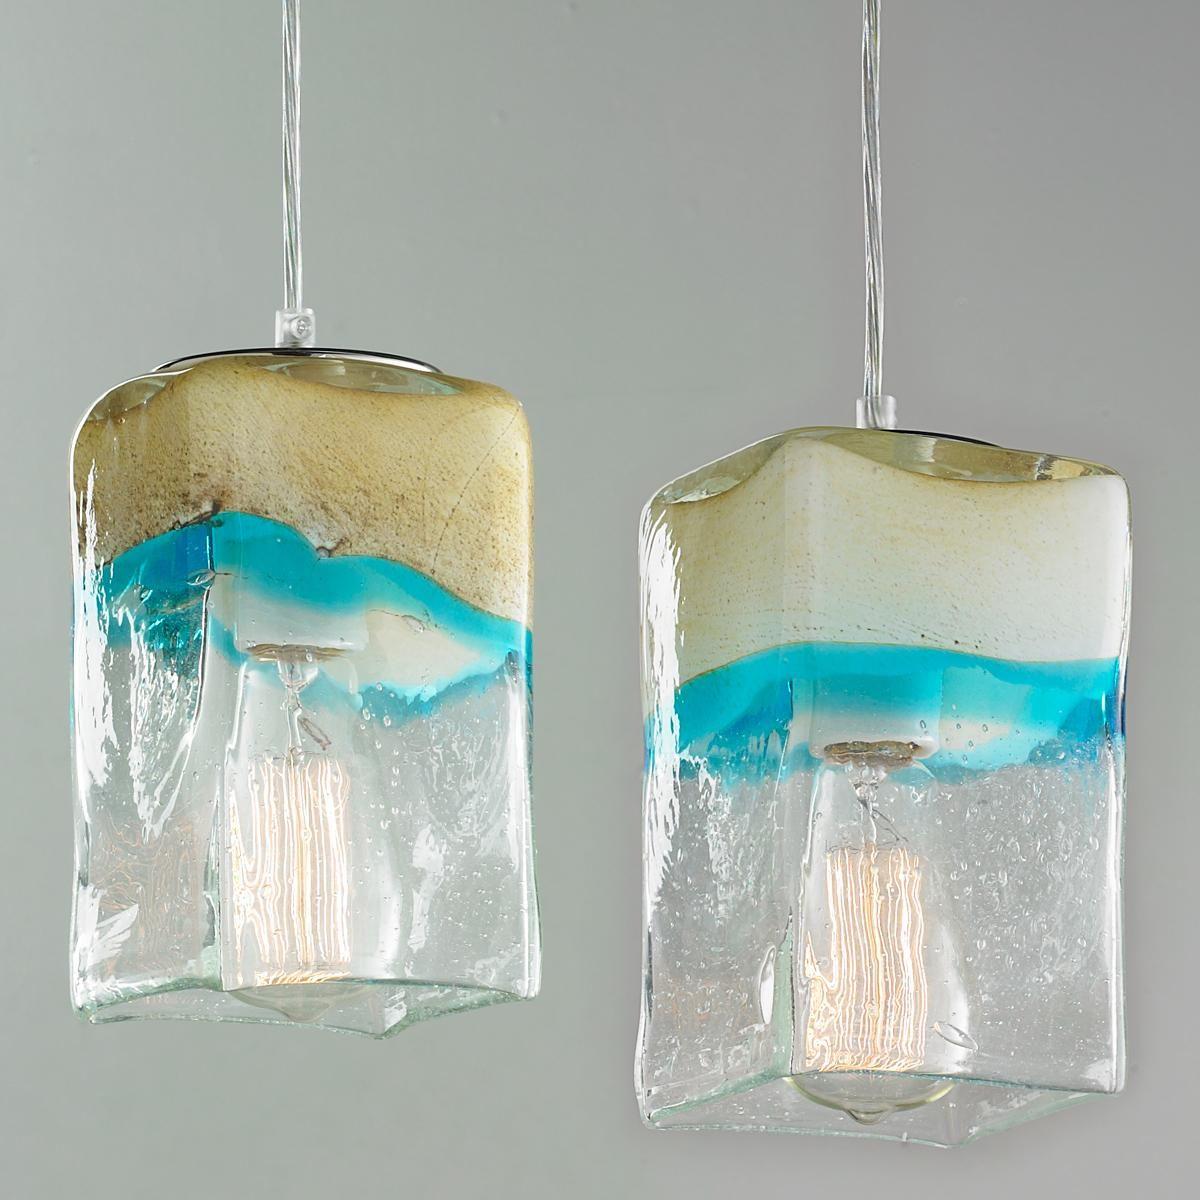 Strata art glass pendant light cream art glass pendants and strata art glass pendant light cream art glass pendants and pendant lighting aloadofball Choice Image